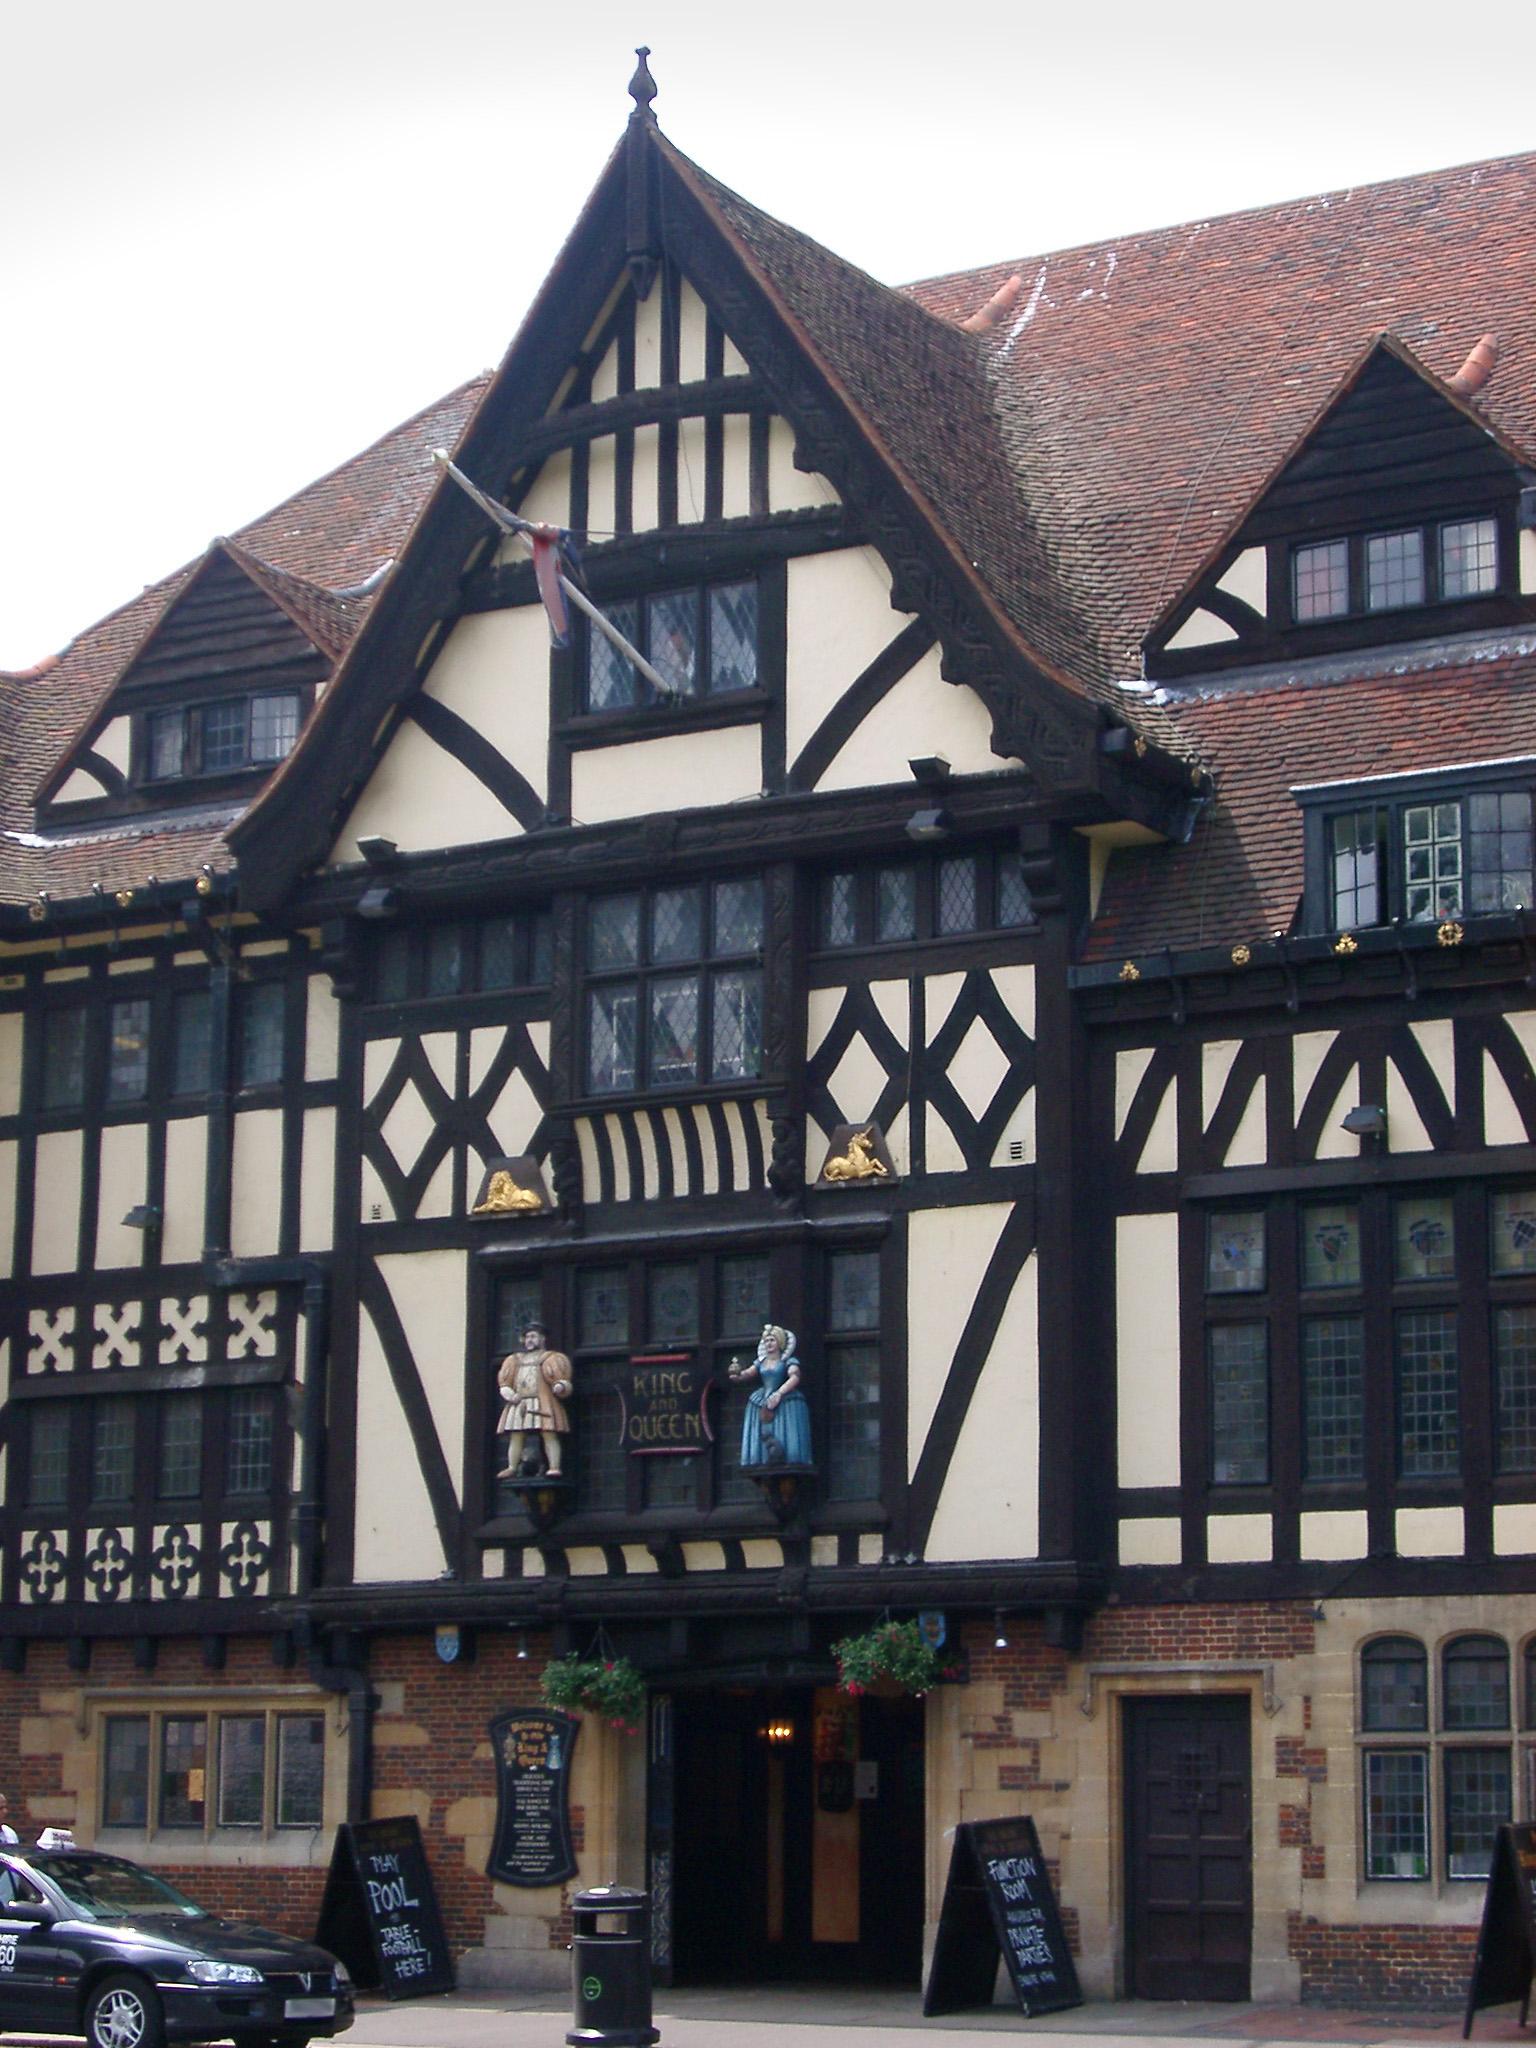 Free stock photo of tudor frame pub facade photoeverywhere for Tutor house